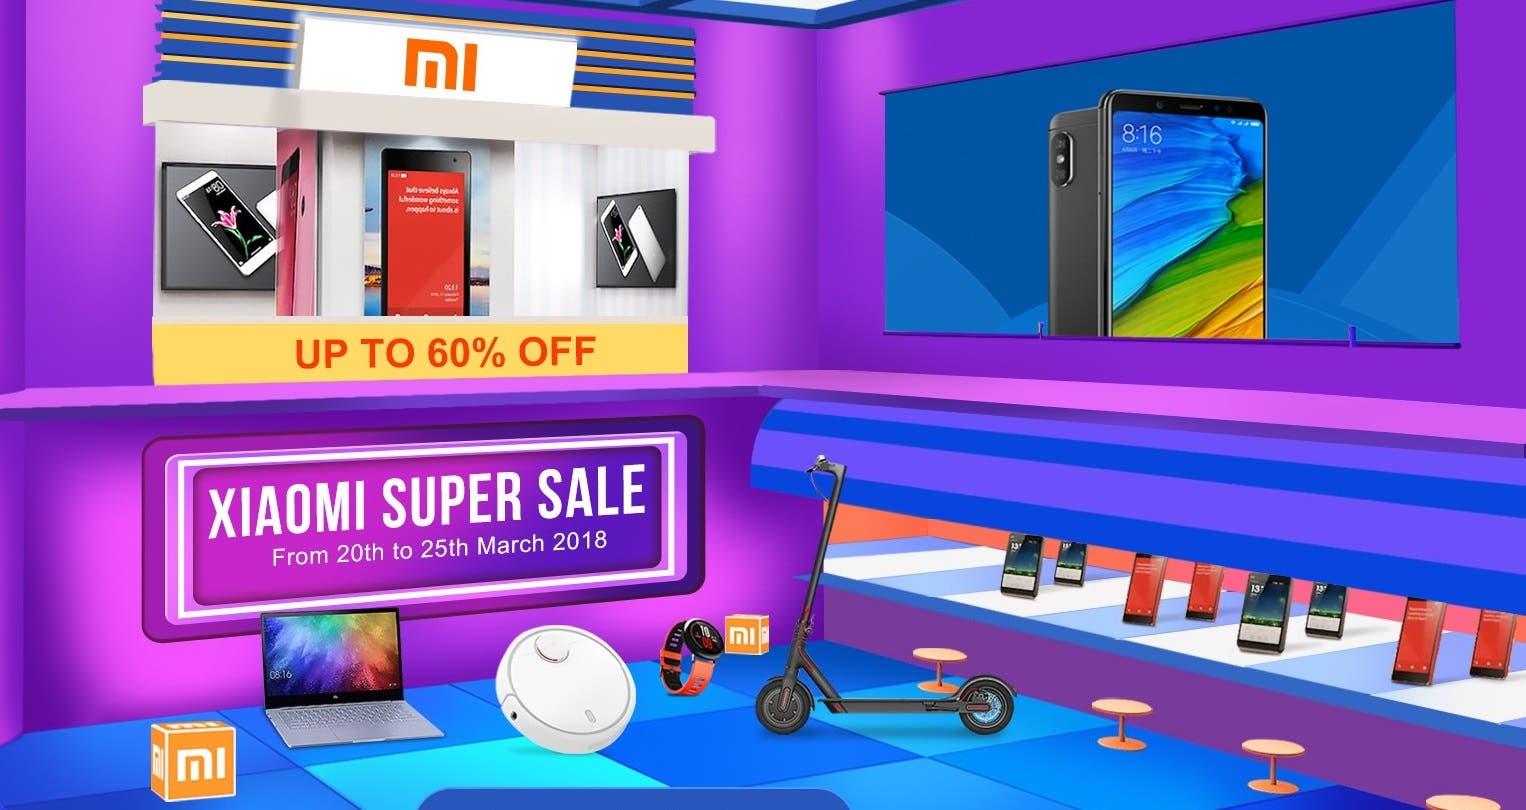 Geekmaxi's Xiaomi Super Sale